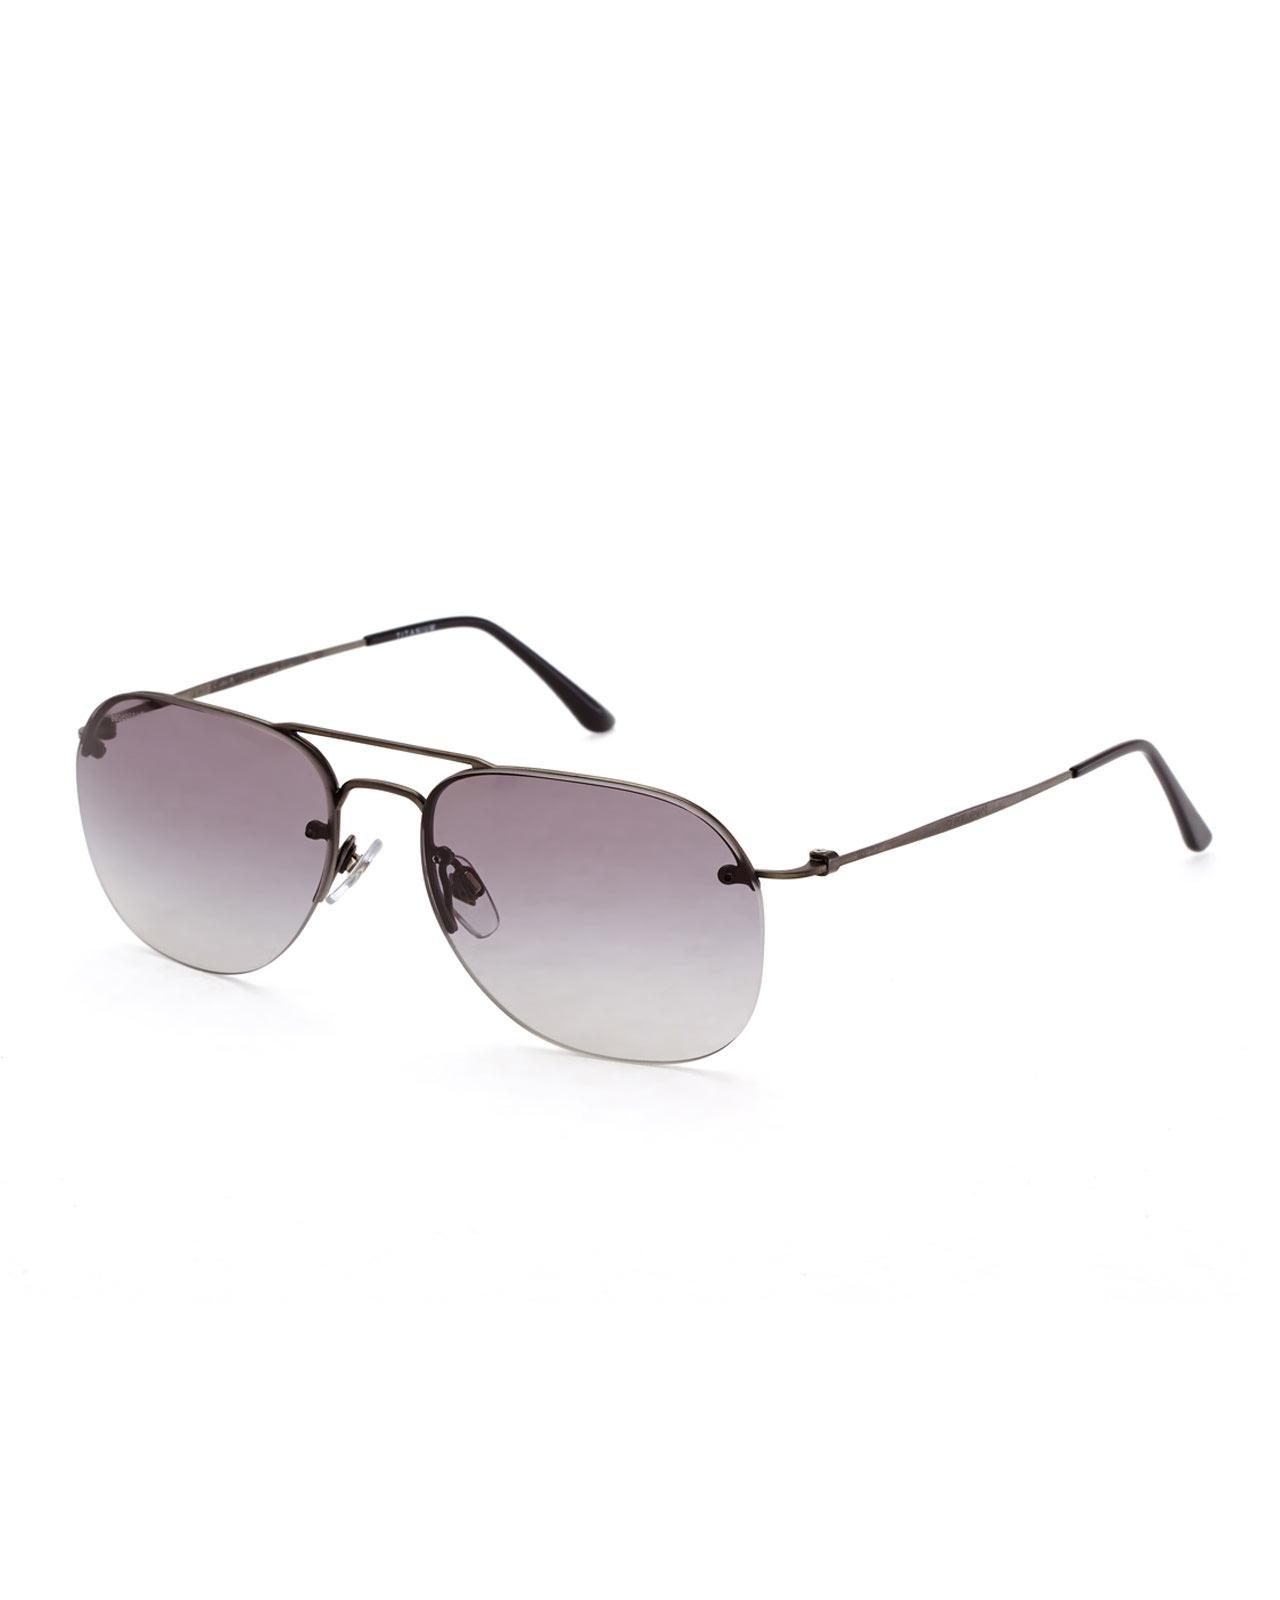 Rimless Glasses Armani : Giorgio armani Ar6004 Gunmetal Rimless Aviator Sunglasses ...